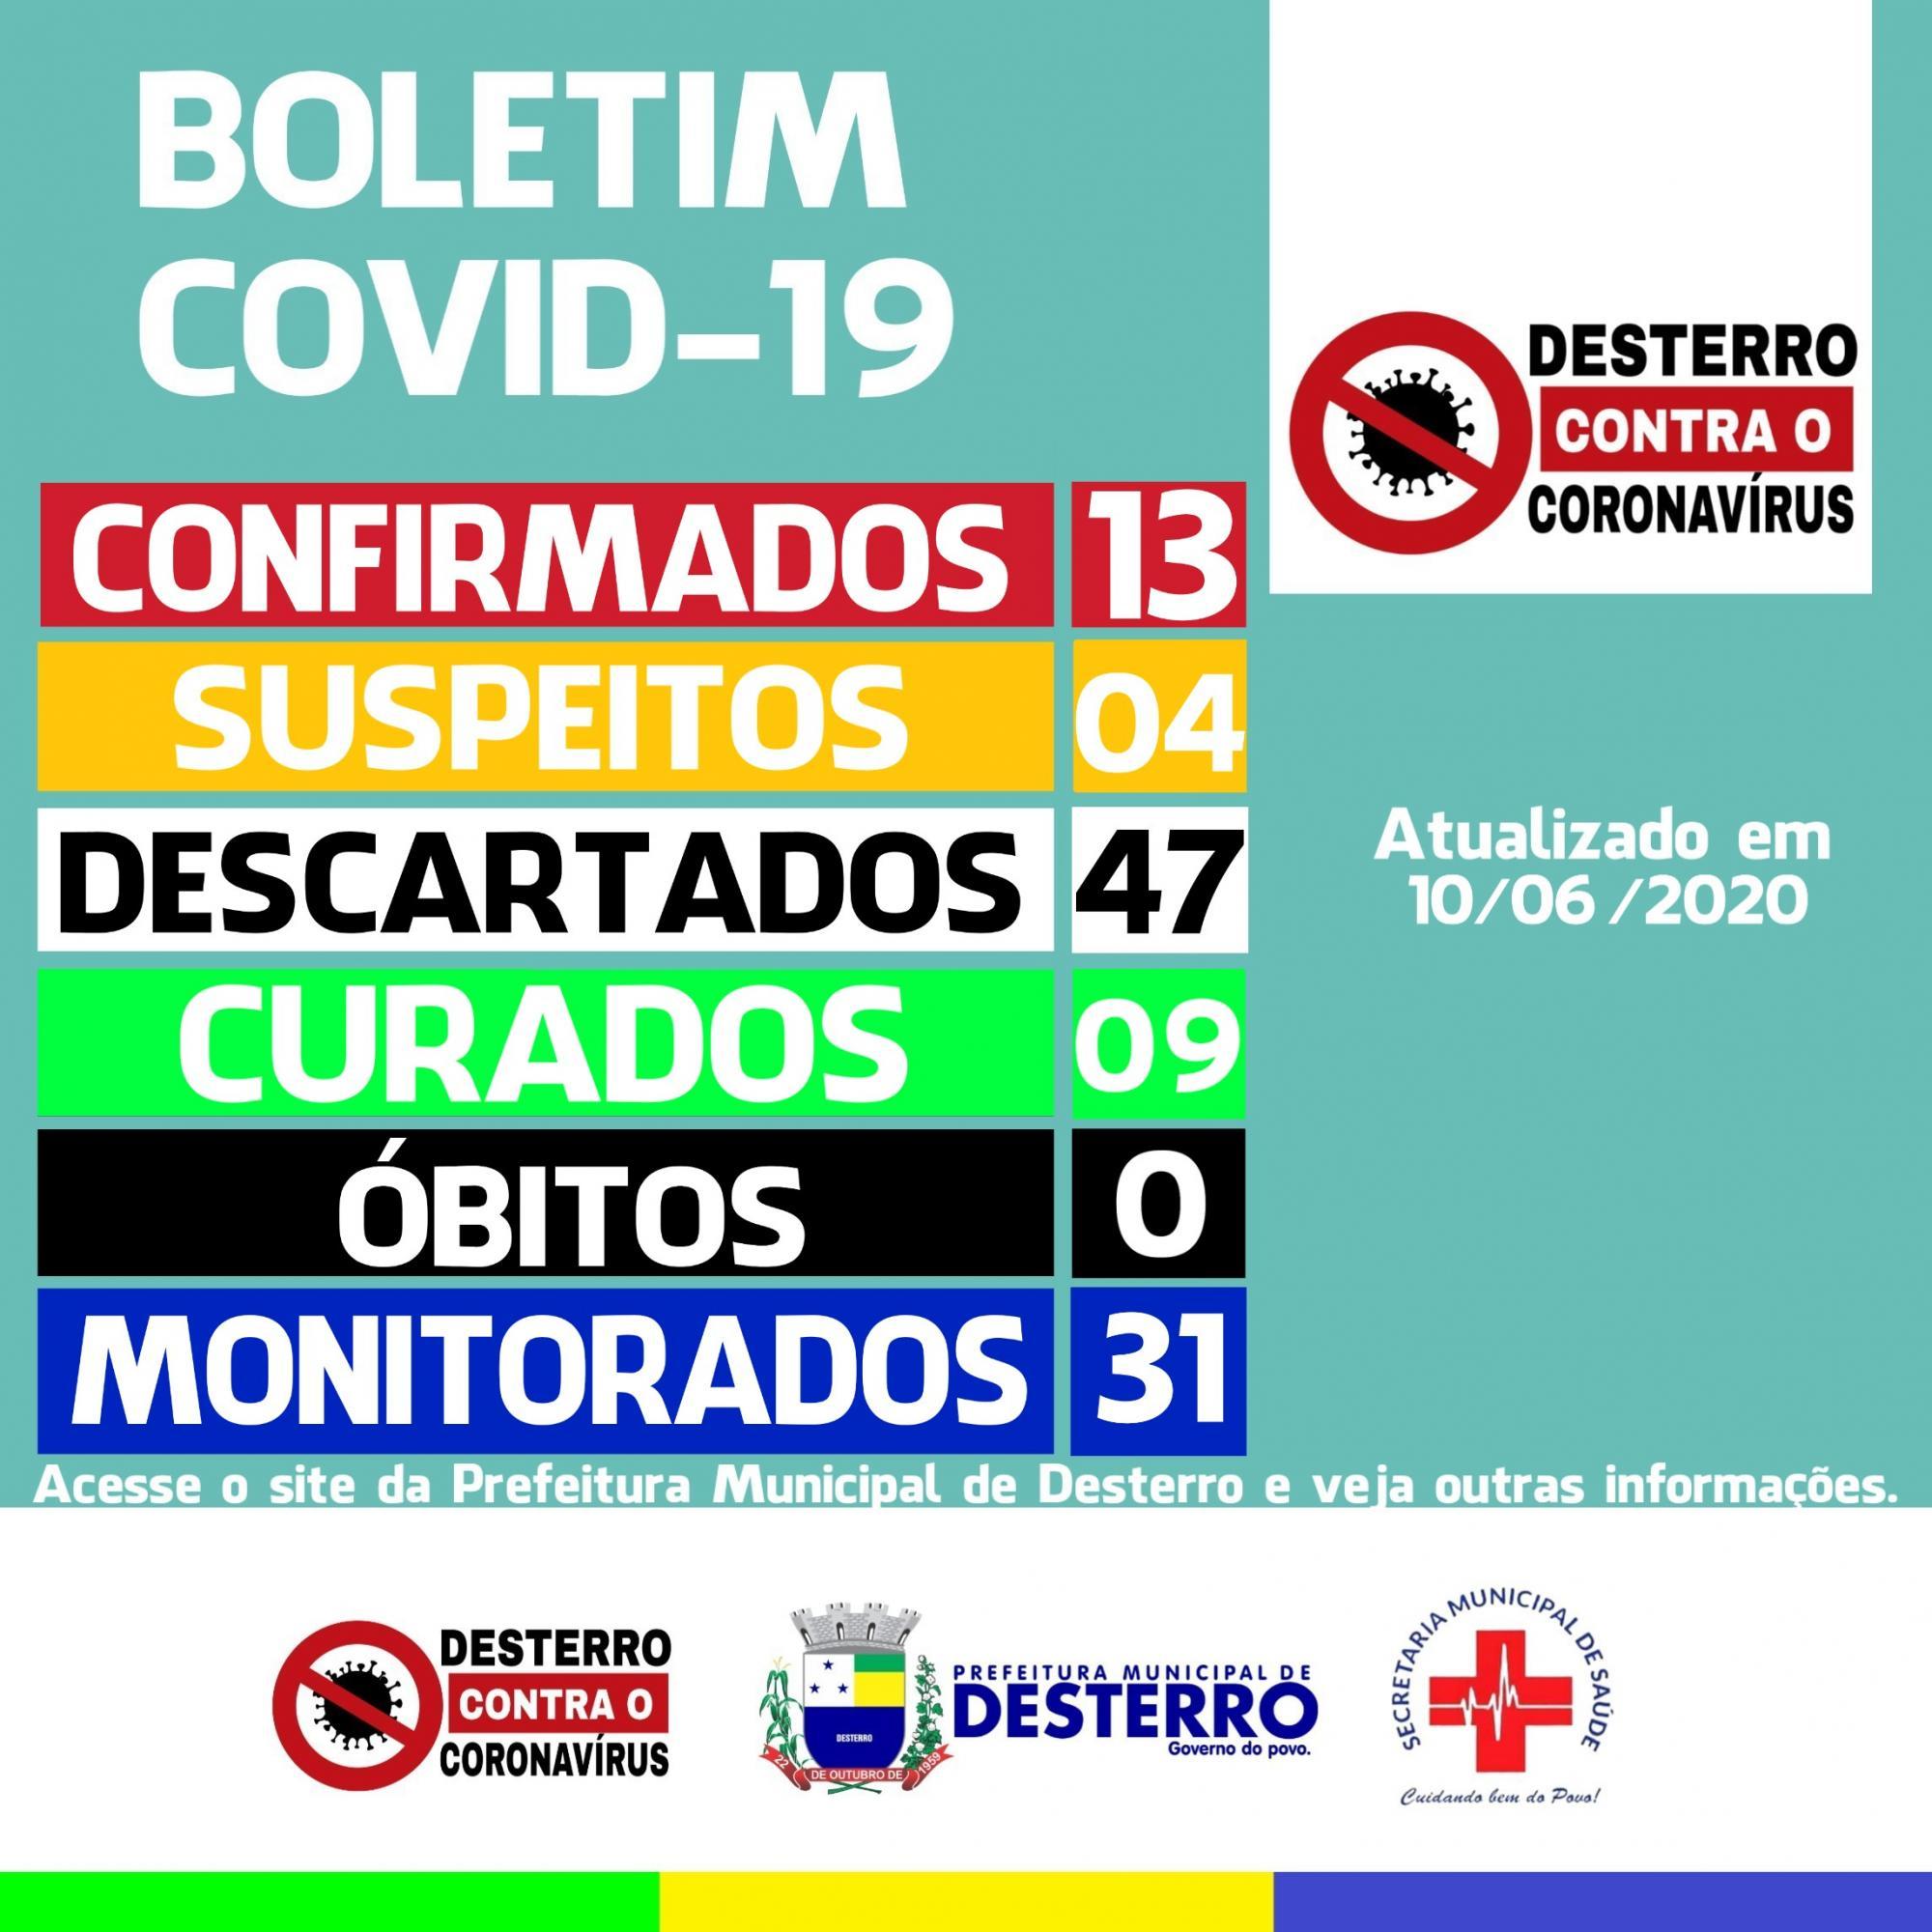 Boletim Covid-19 (10/06/2020)